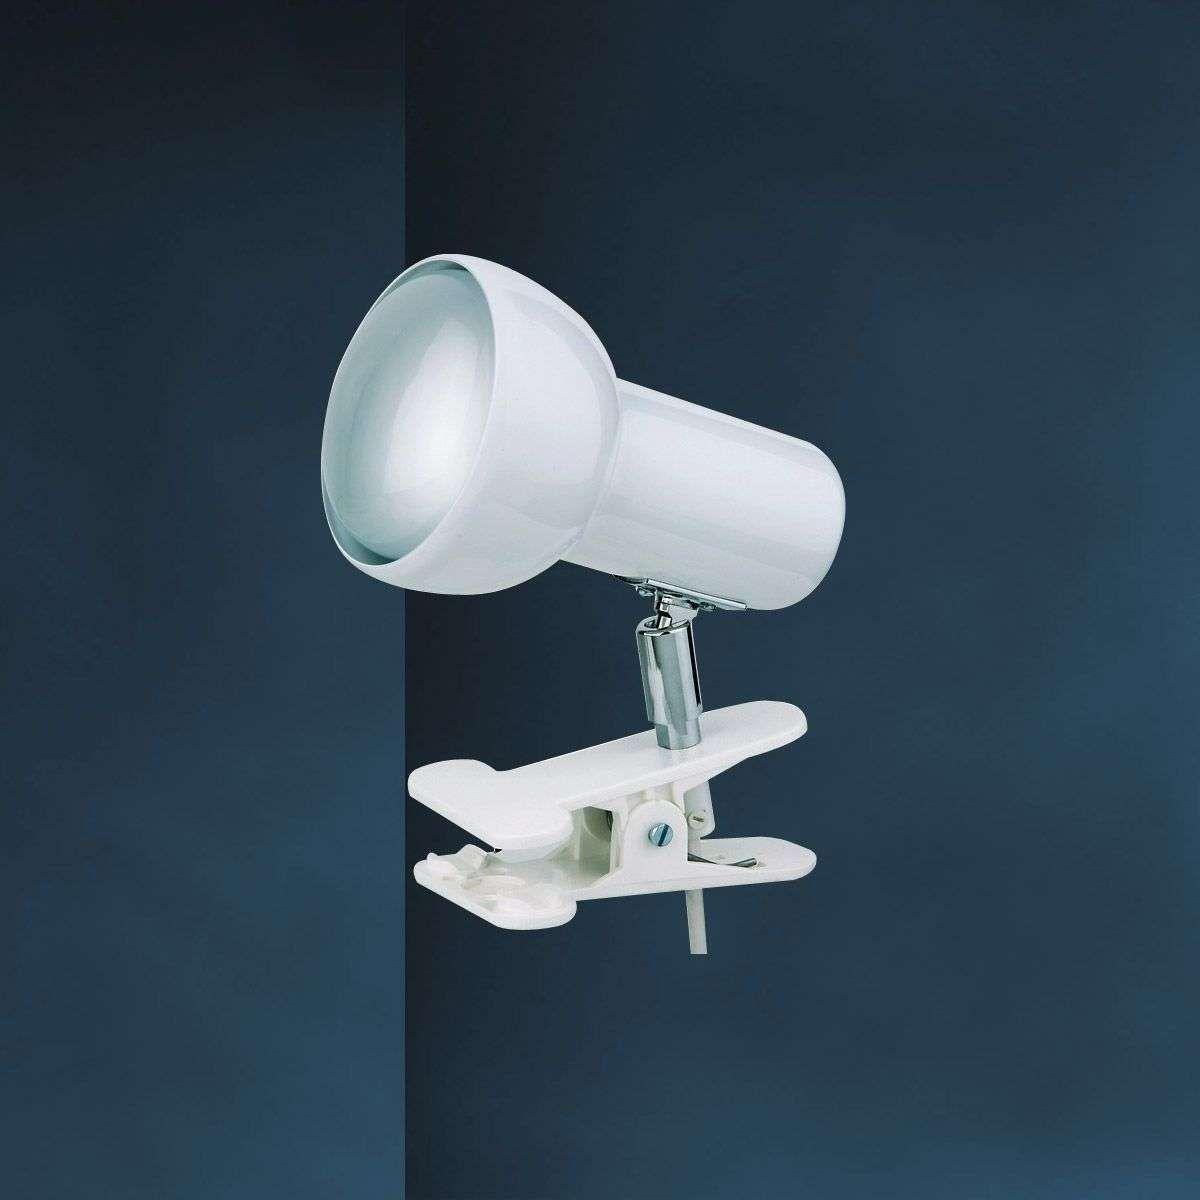 White Clip On Light Eifel In 2020 Light Wall Spotlights Interior Styling